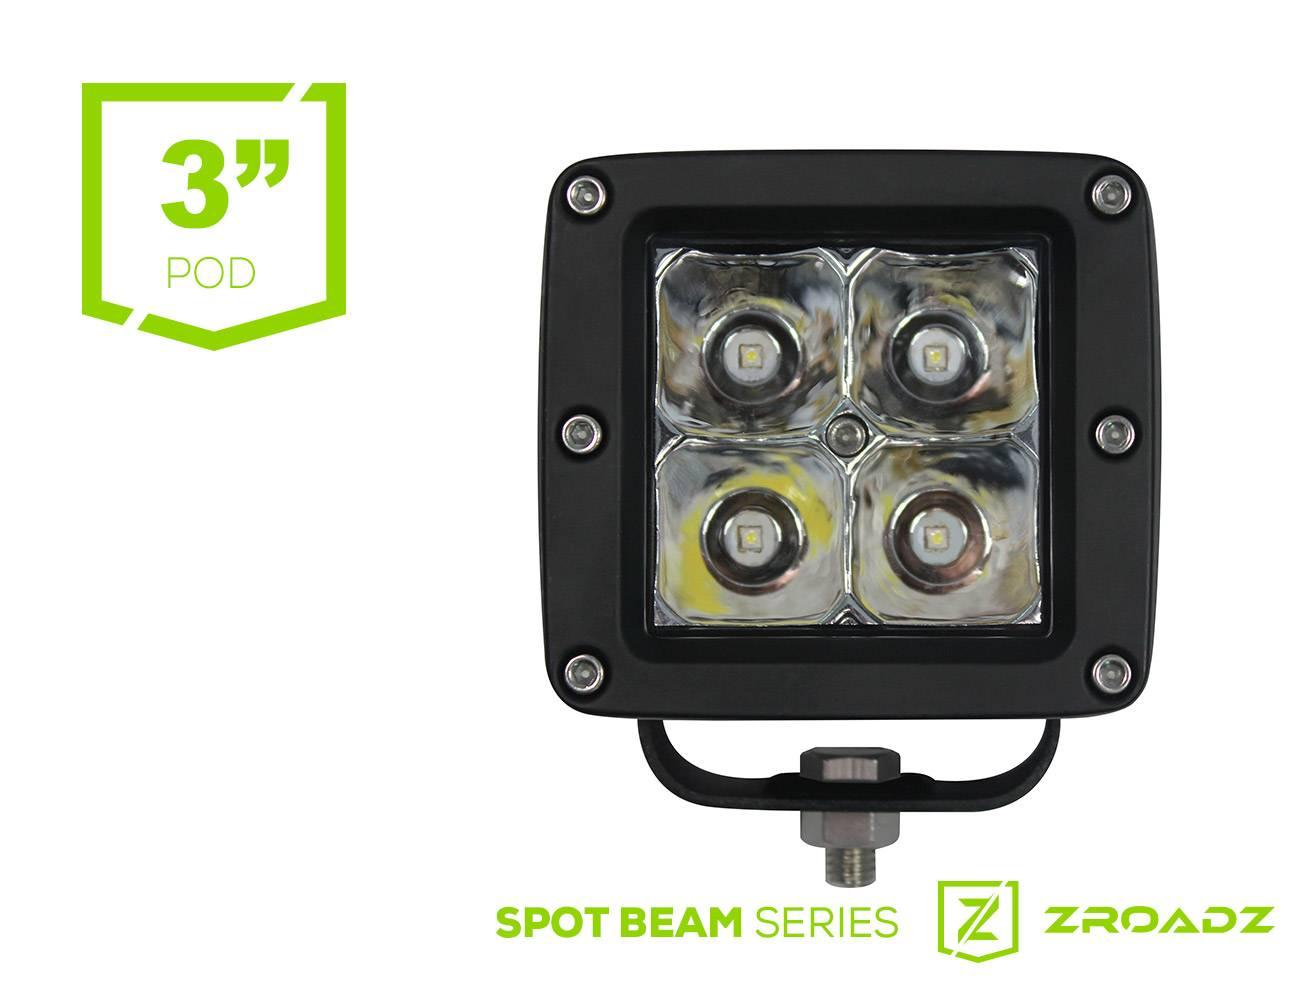 (1) 3 Inch LED Flood Beam Pod Lights - PN #Z30BC14W20